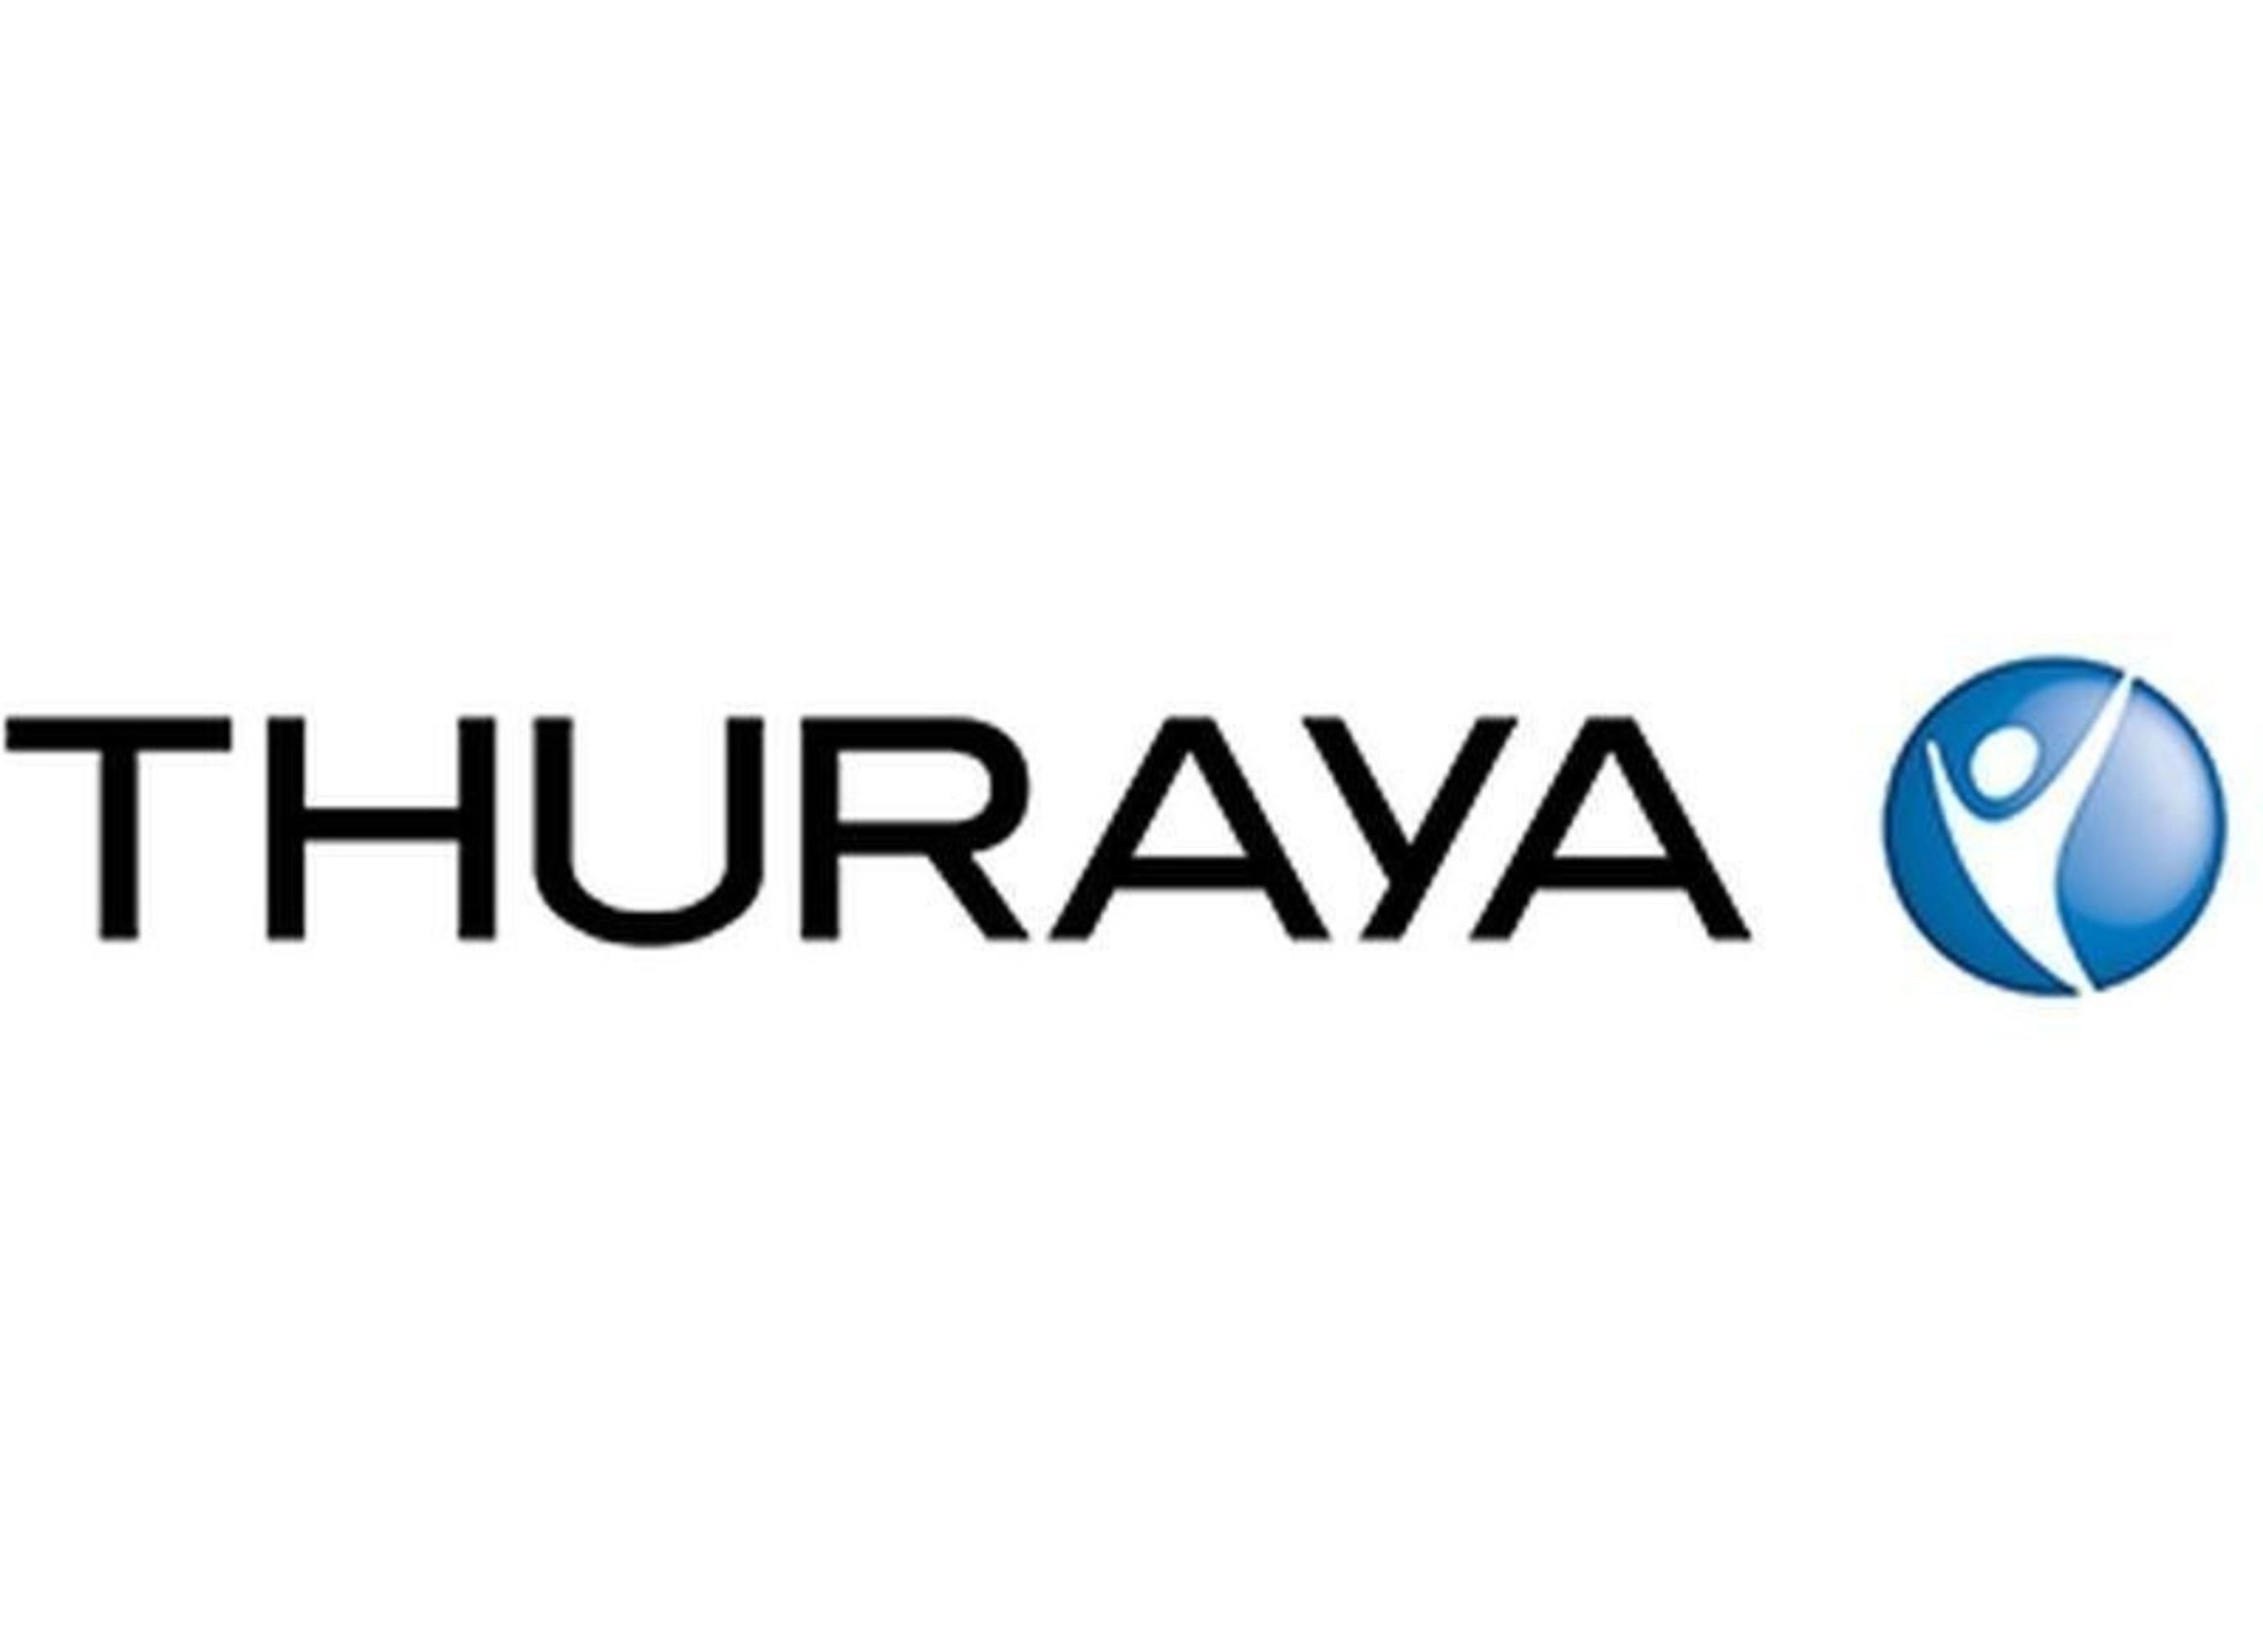 Thuraya Launches a Dual Mode Satellite & LTE Hotspot